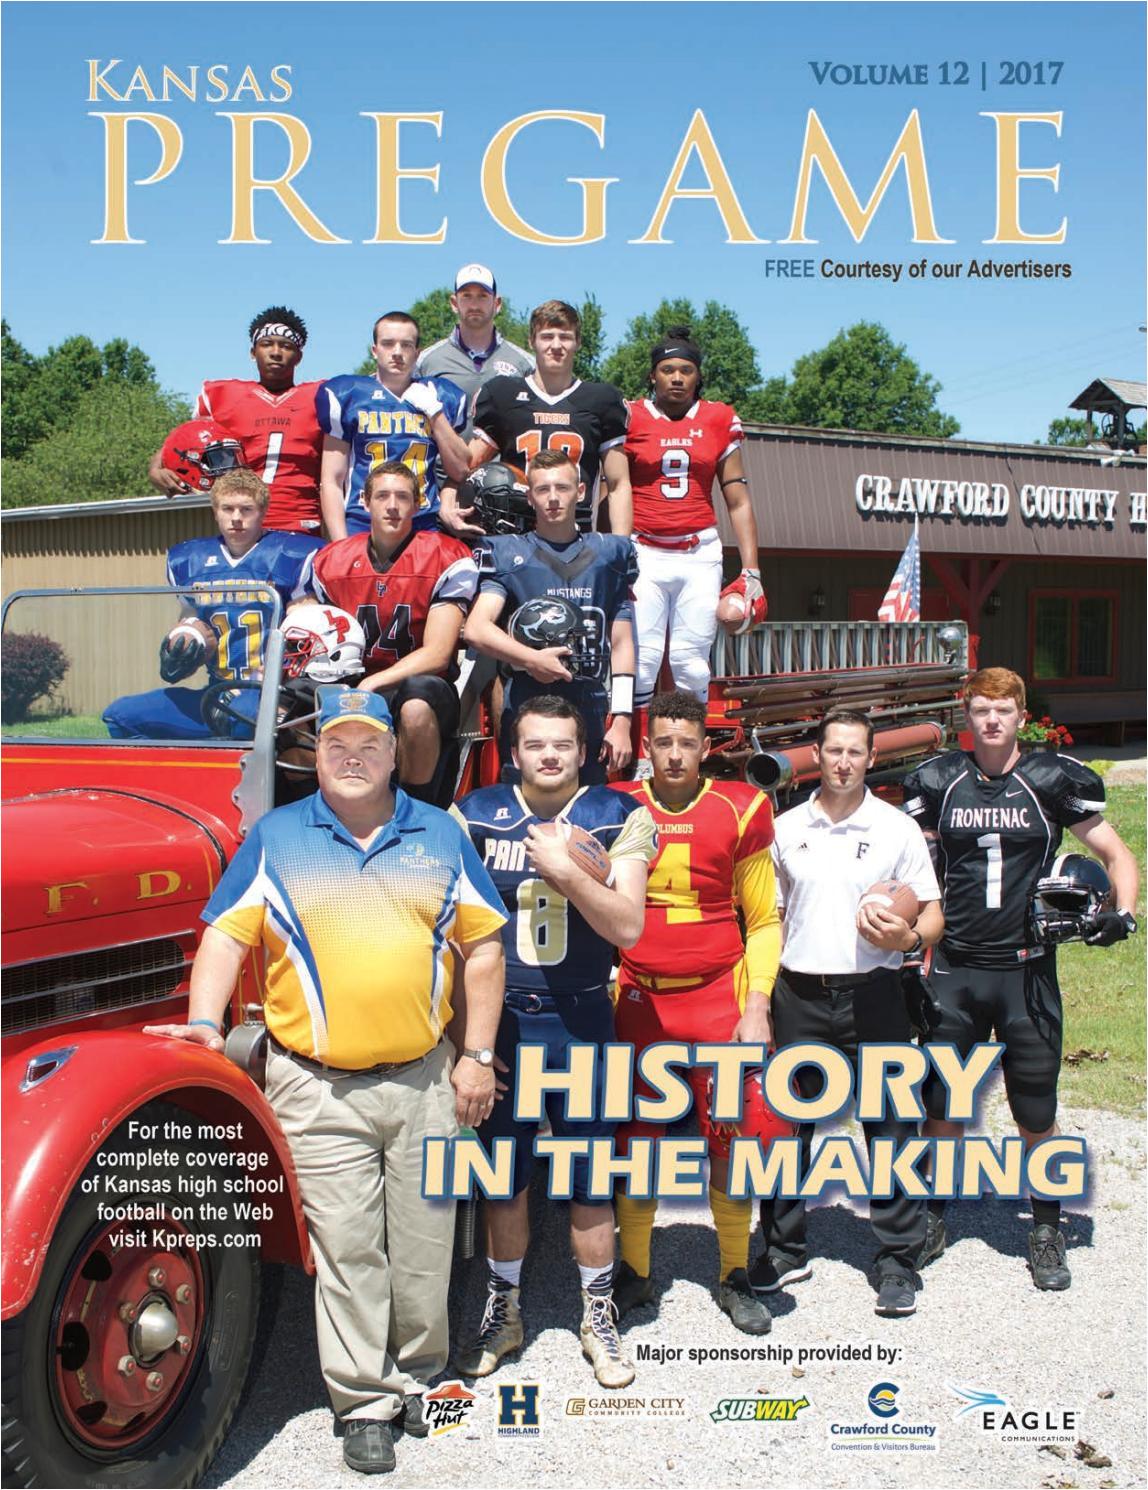 kansas pregame football preview 2017 by sixteen 60 publishing co issuu